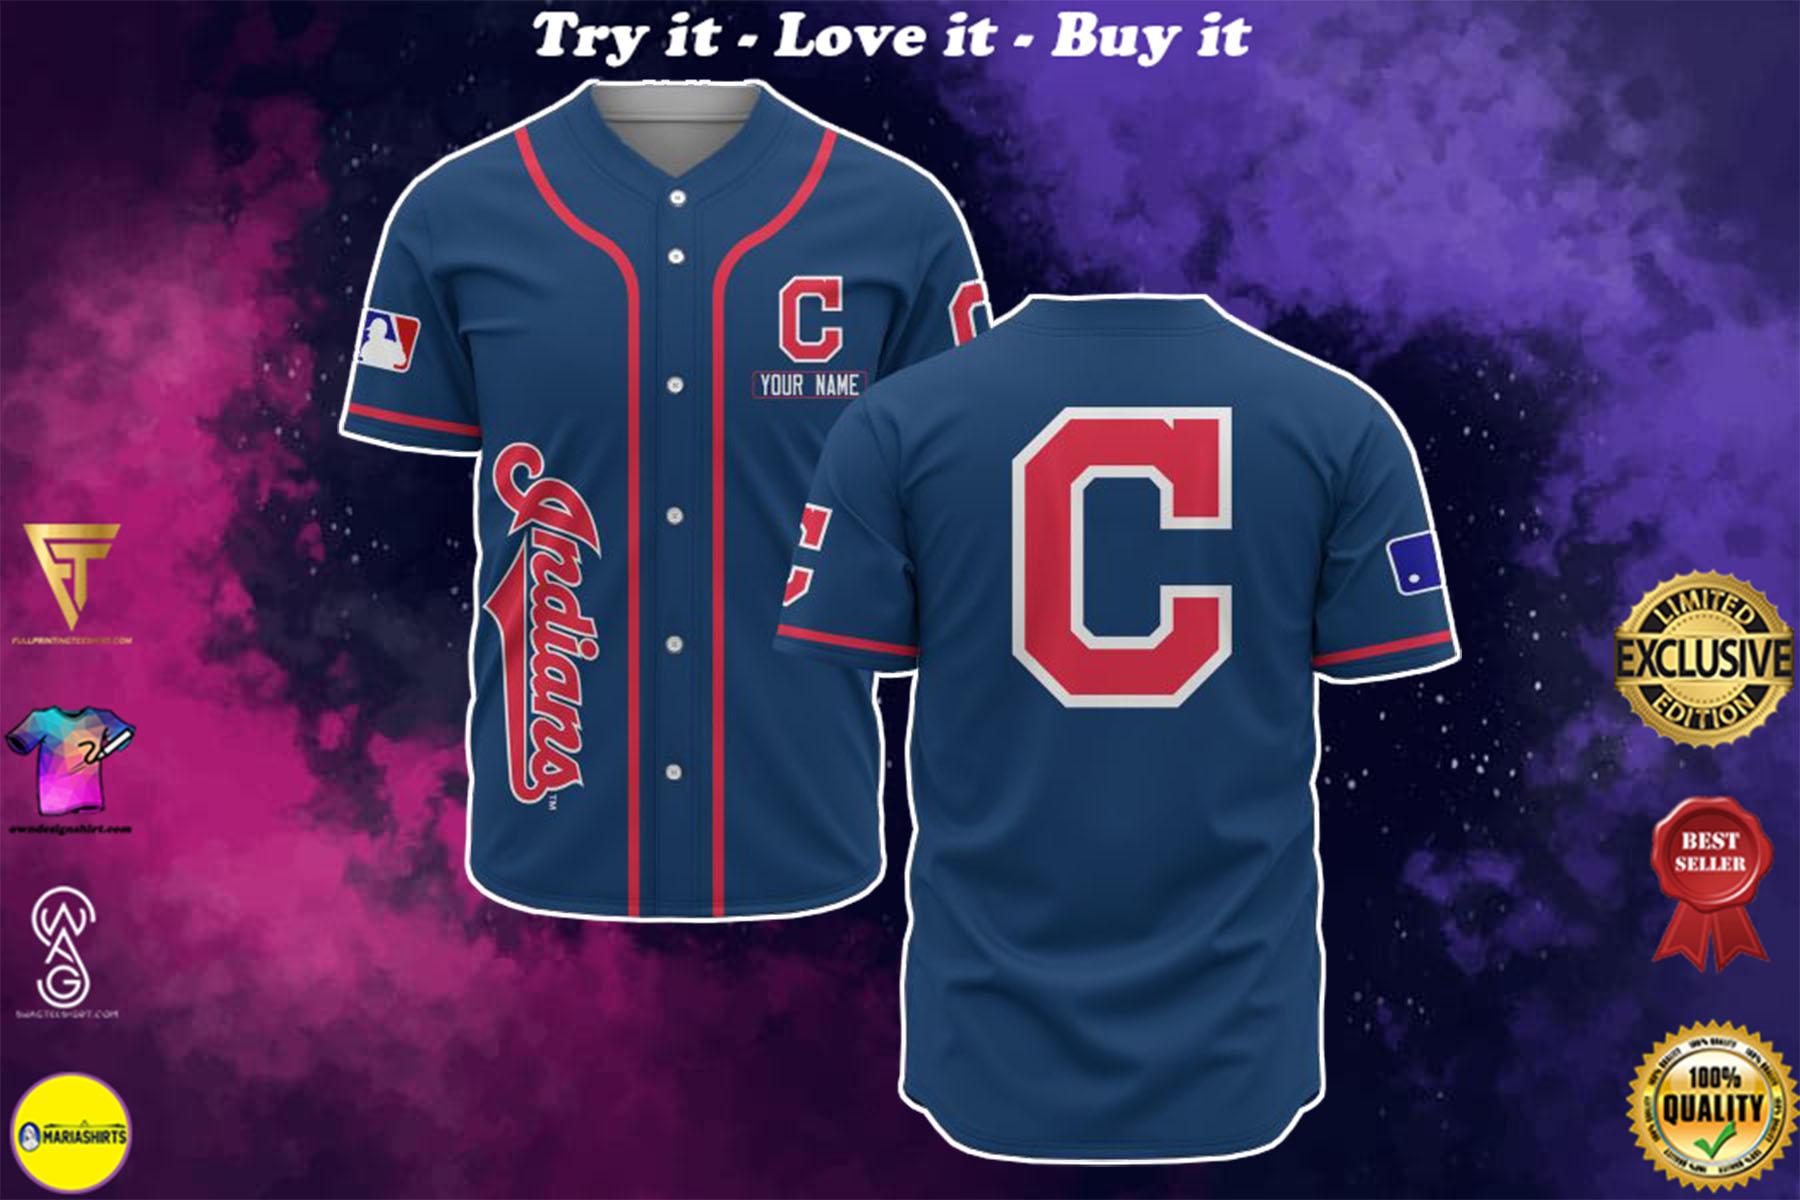 [special edition] custom name cleveland indians baseball shirt - maria